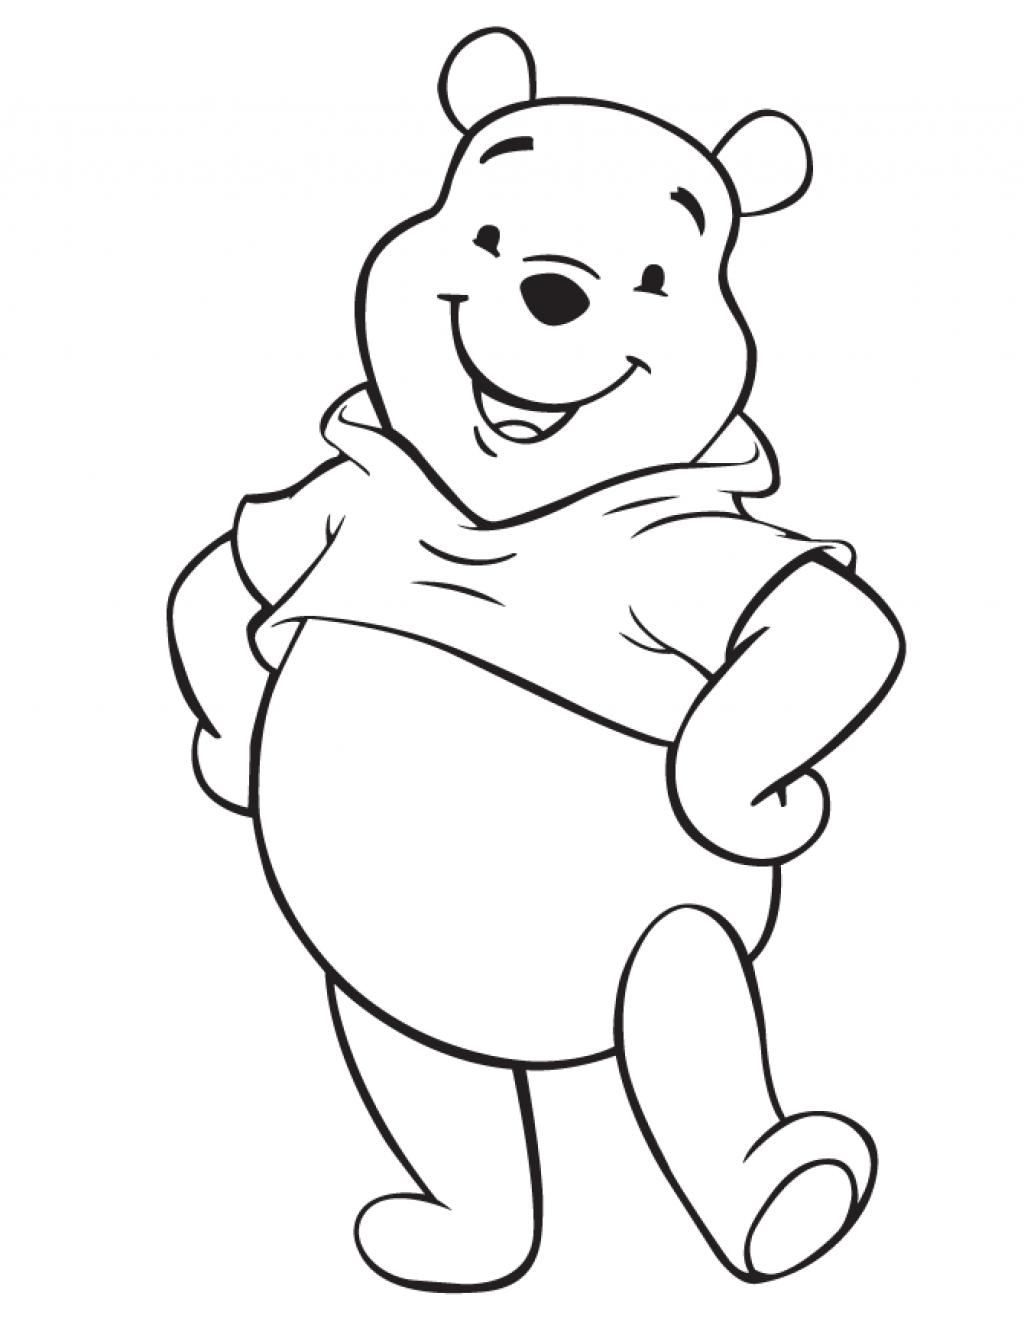 Pencil Cartoon Drawings Free Download Best Pencil Cartoon Drawings